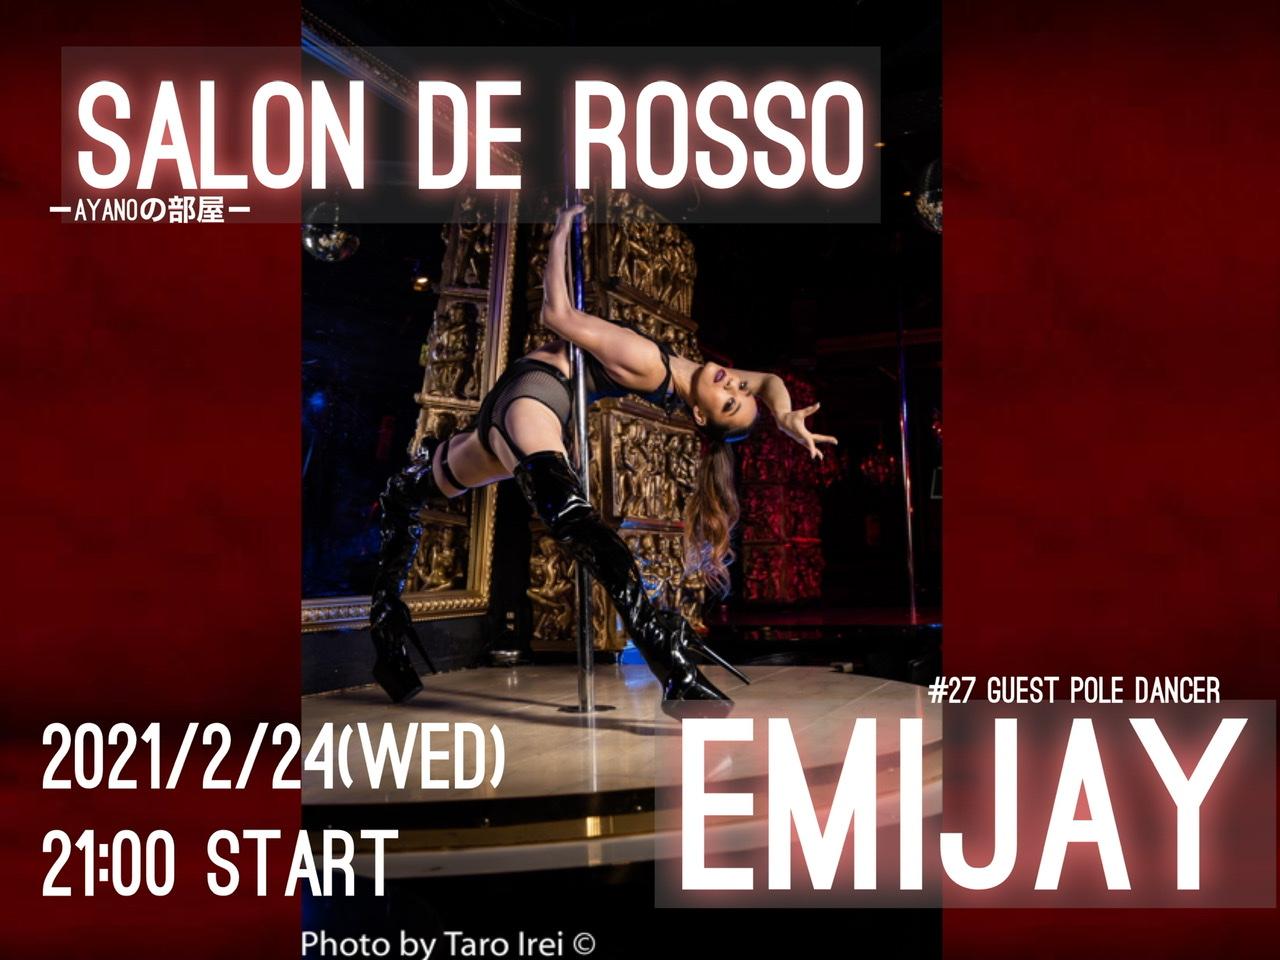 【 Salon de ROSSO ーAYANOの部屋ー】 〜 #27 ゲストポールダンサー  EMIJAY